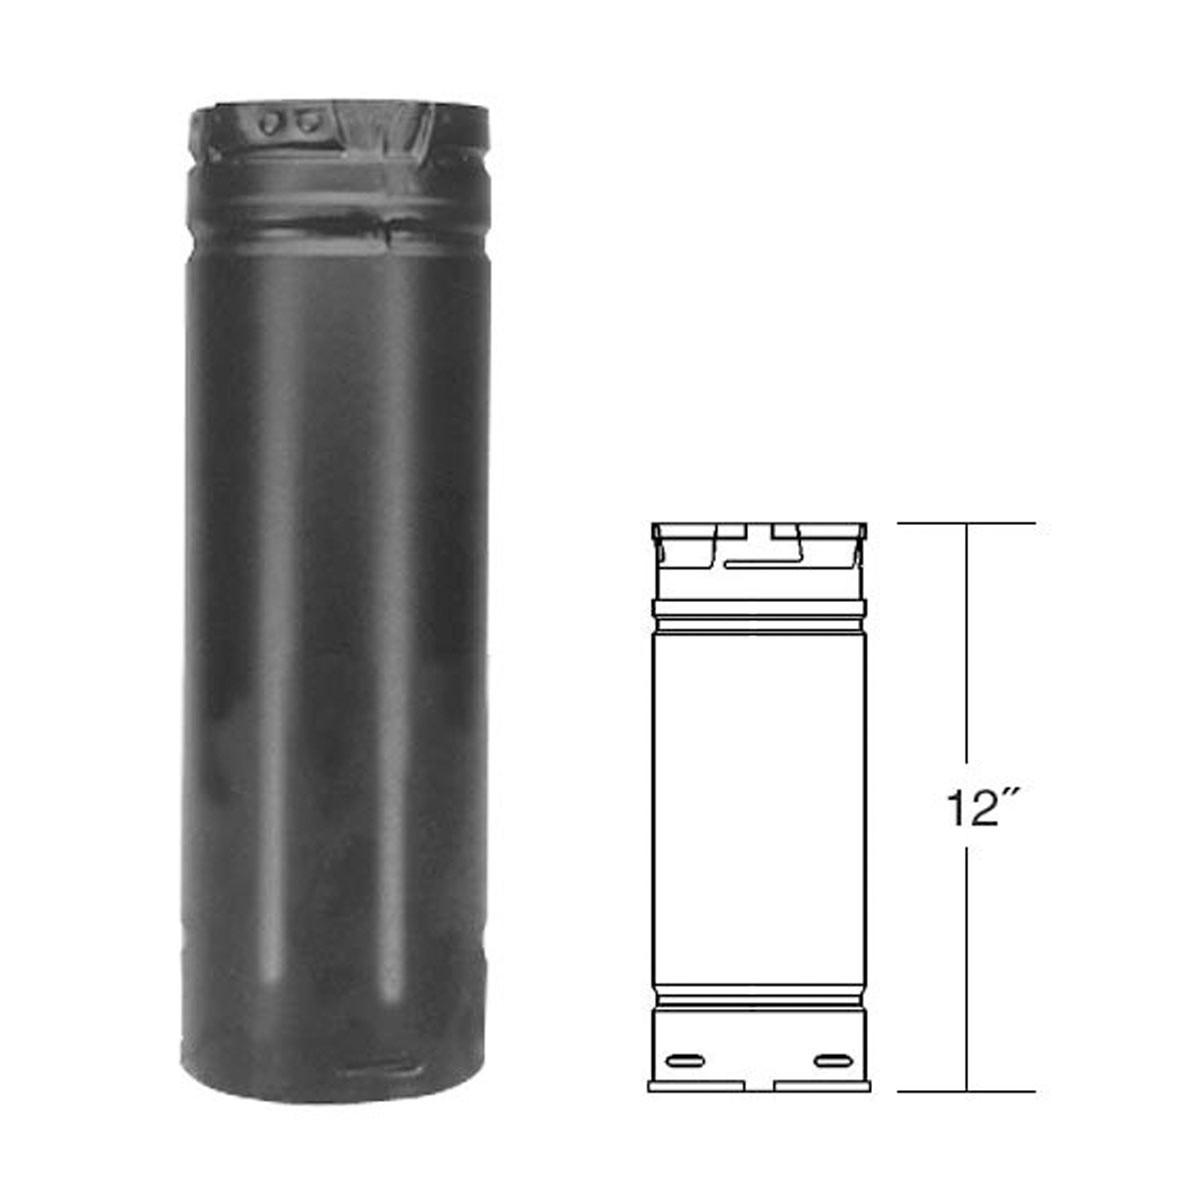 Fireplace Gas Pipe Unique 3 X 12 Pelletvent Pro Black Pellet Stove Chimney Pipe 3pvp 12b